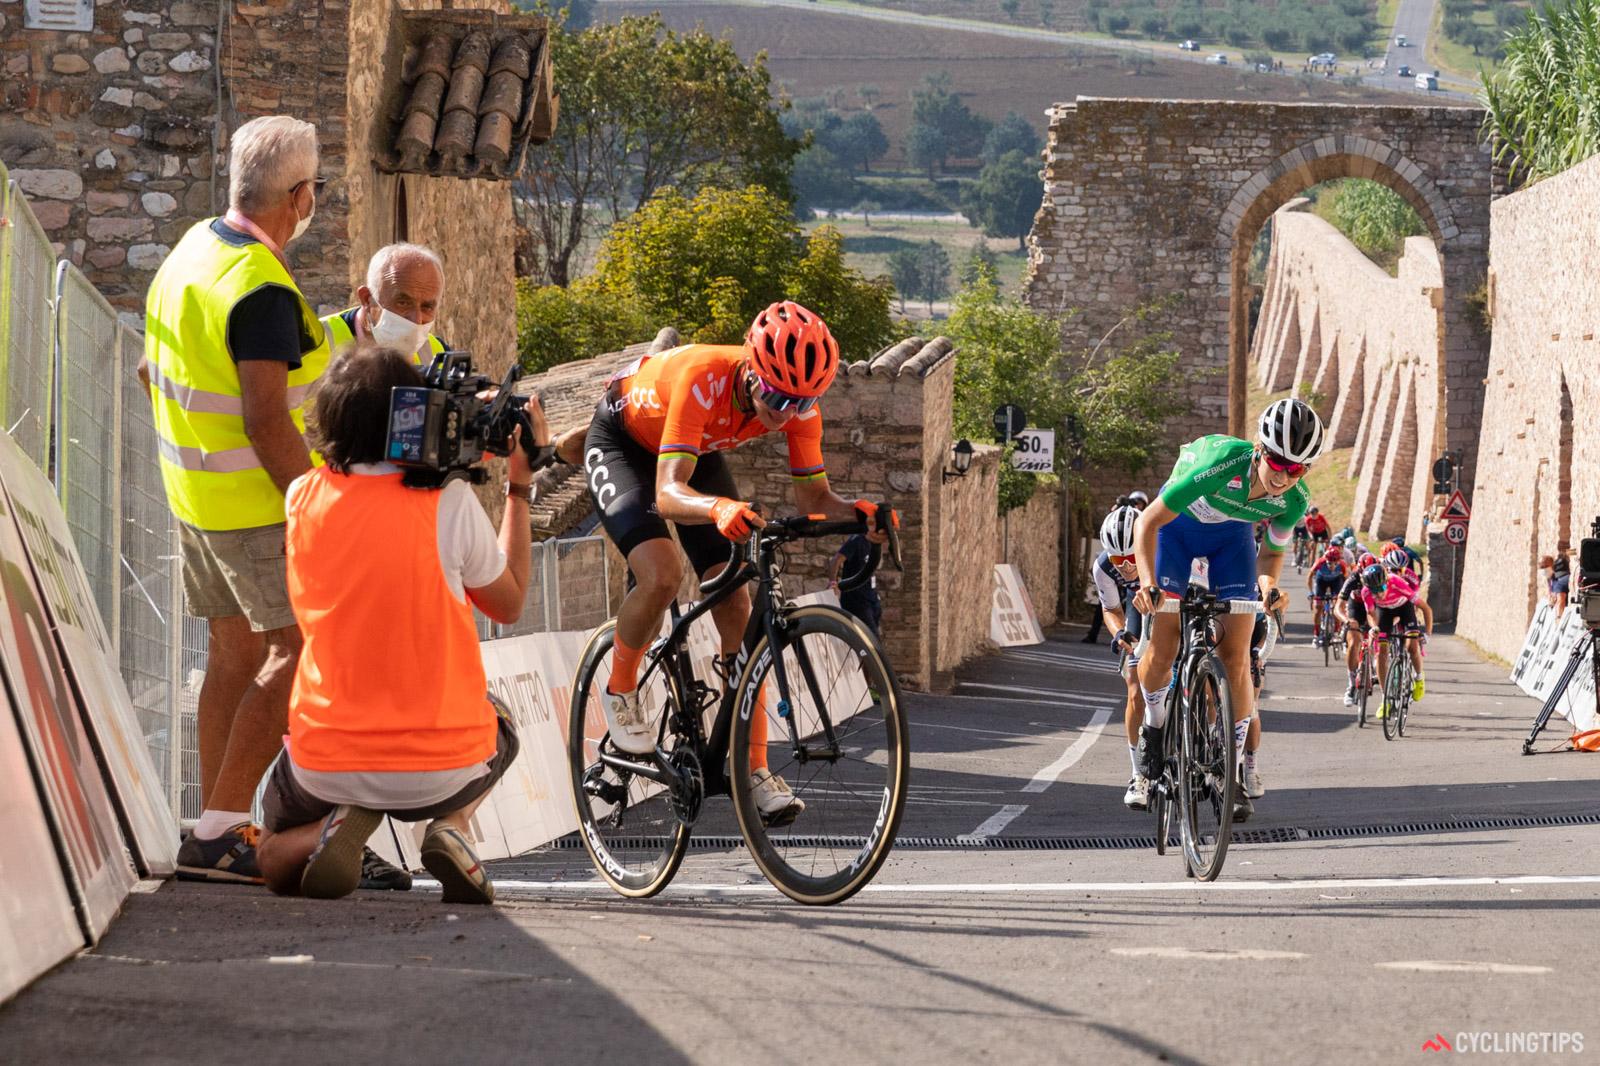 De Giro Rosa, de bijna onzichtbare race